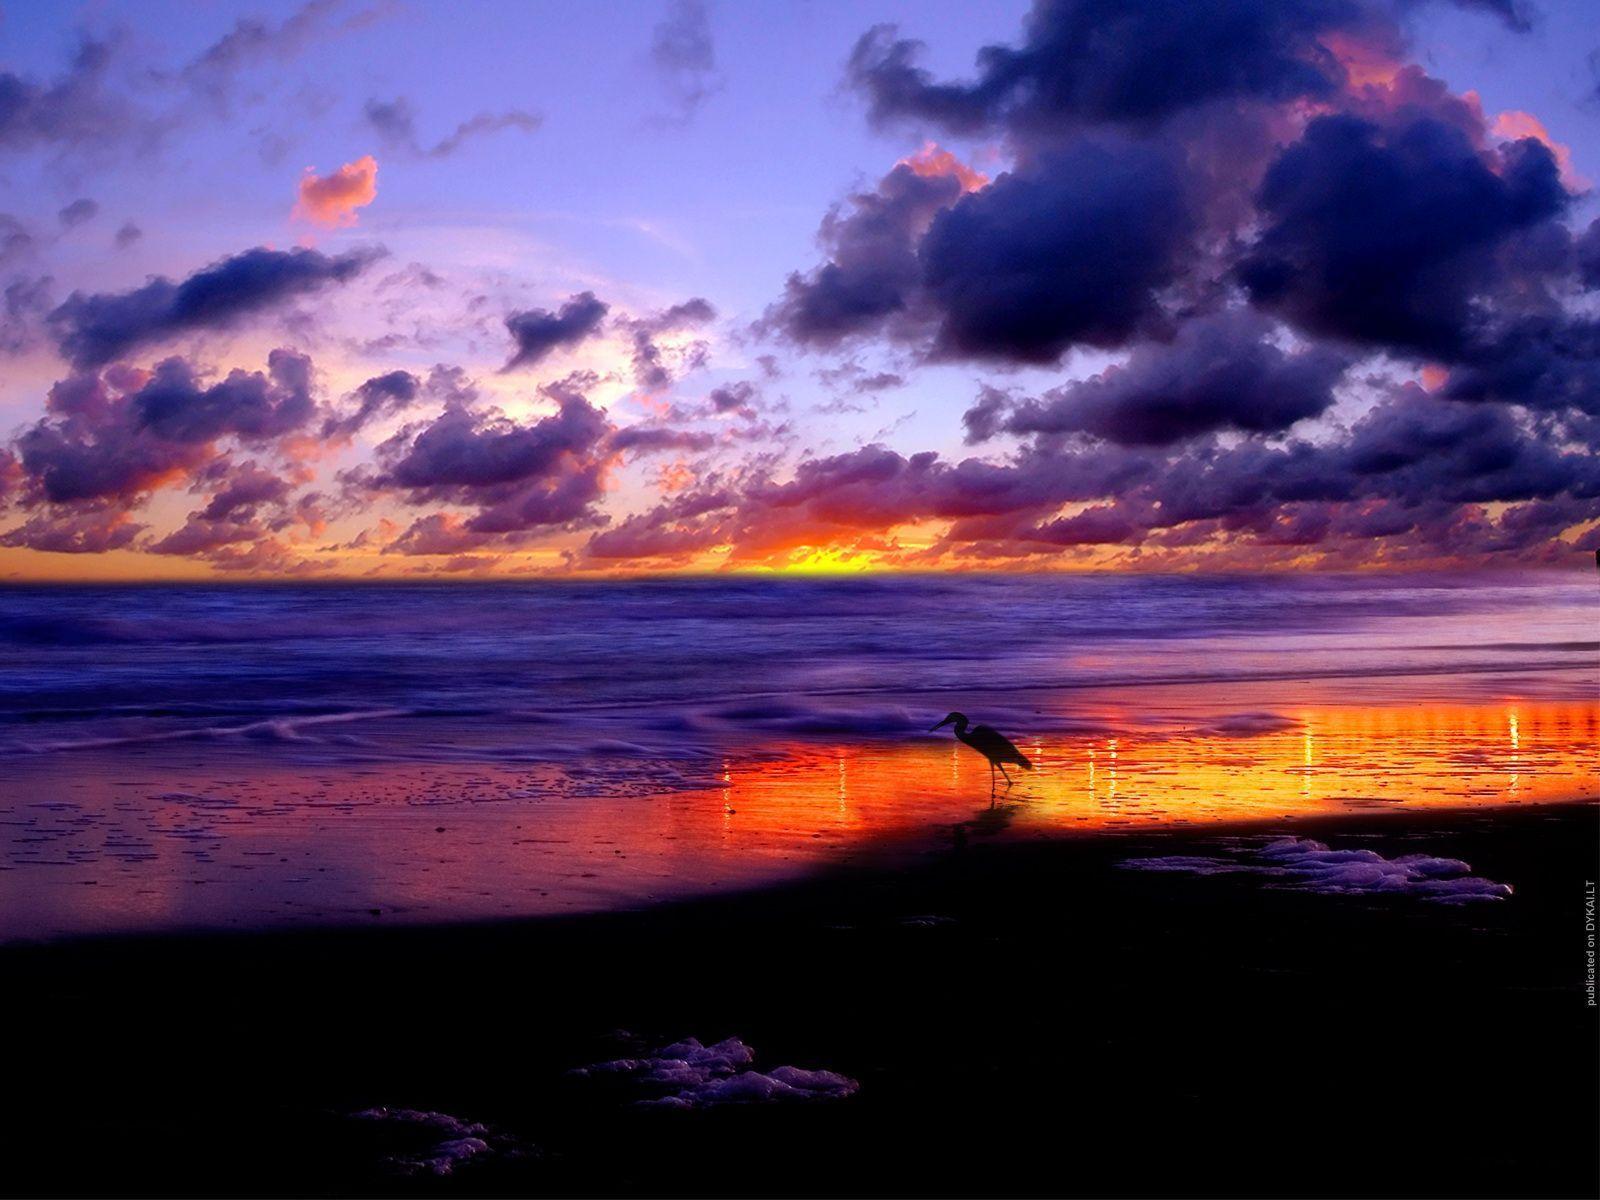 High Resolution Beach Sunset Wallpaper In Nature Scenery Desktop Wallpapers